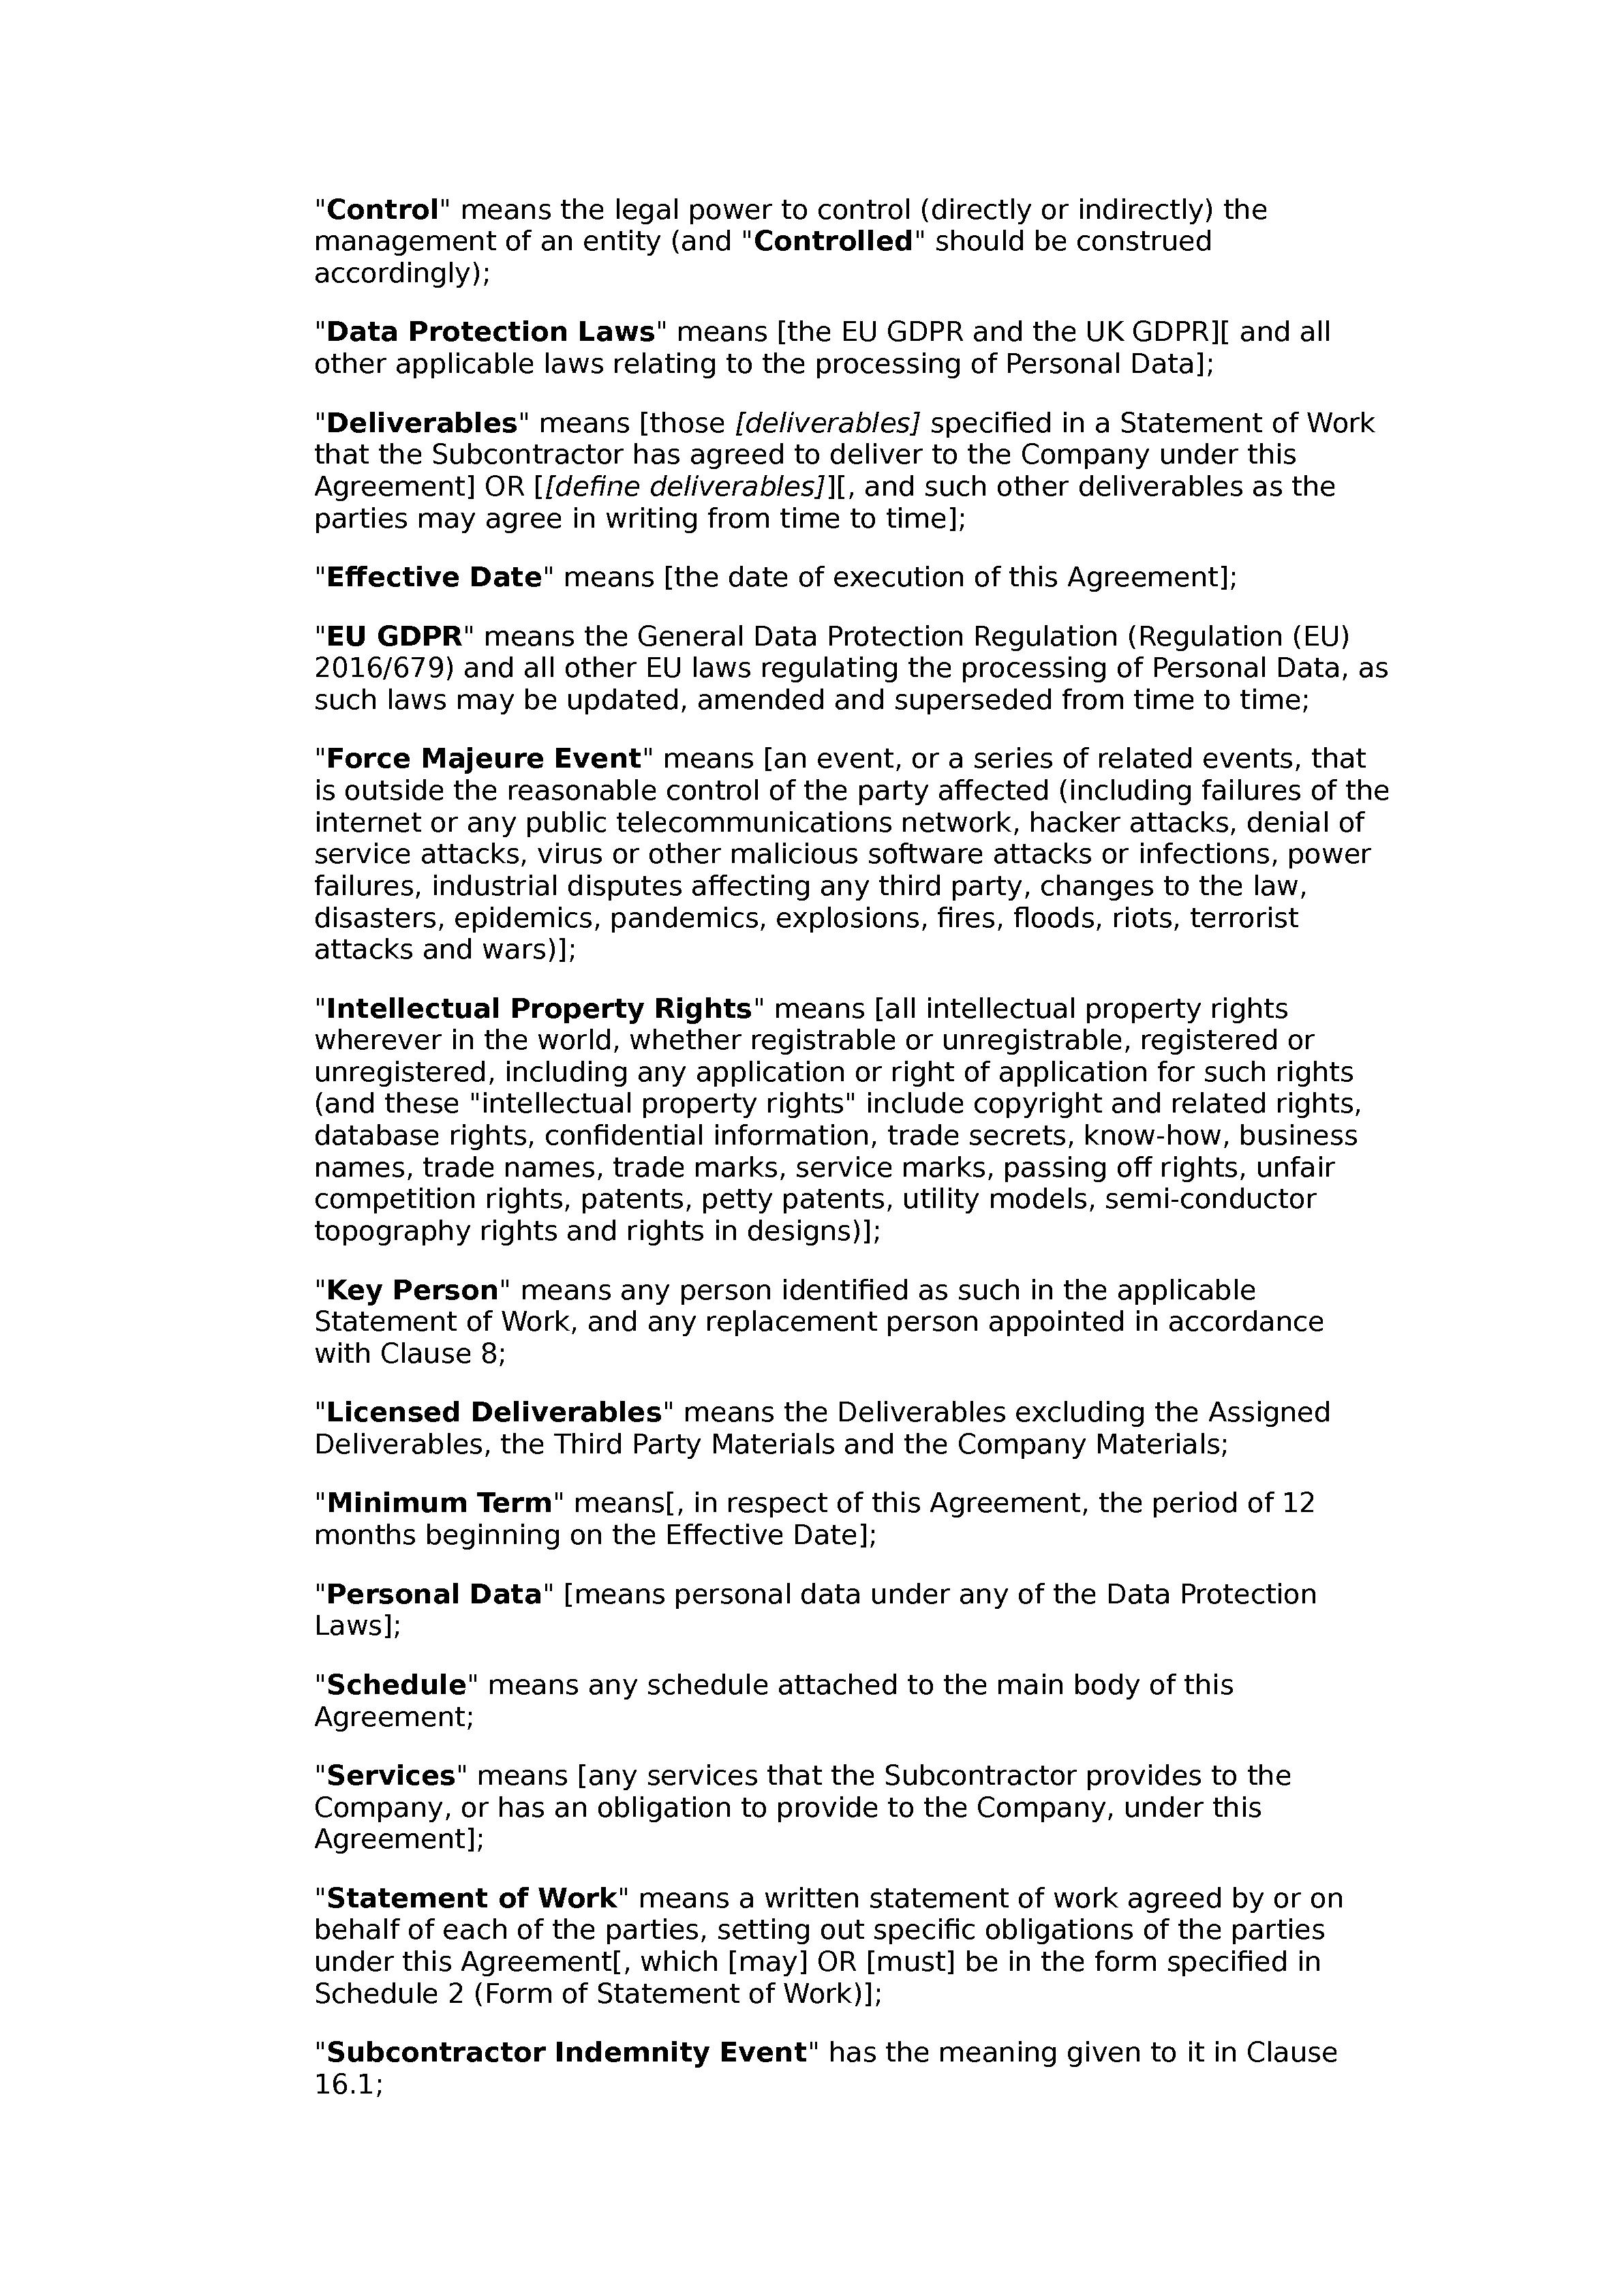 Subcontractor framework agreement (premium) document preview